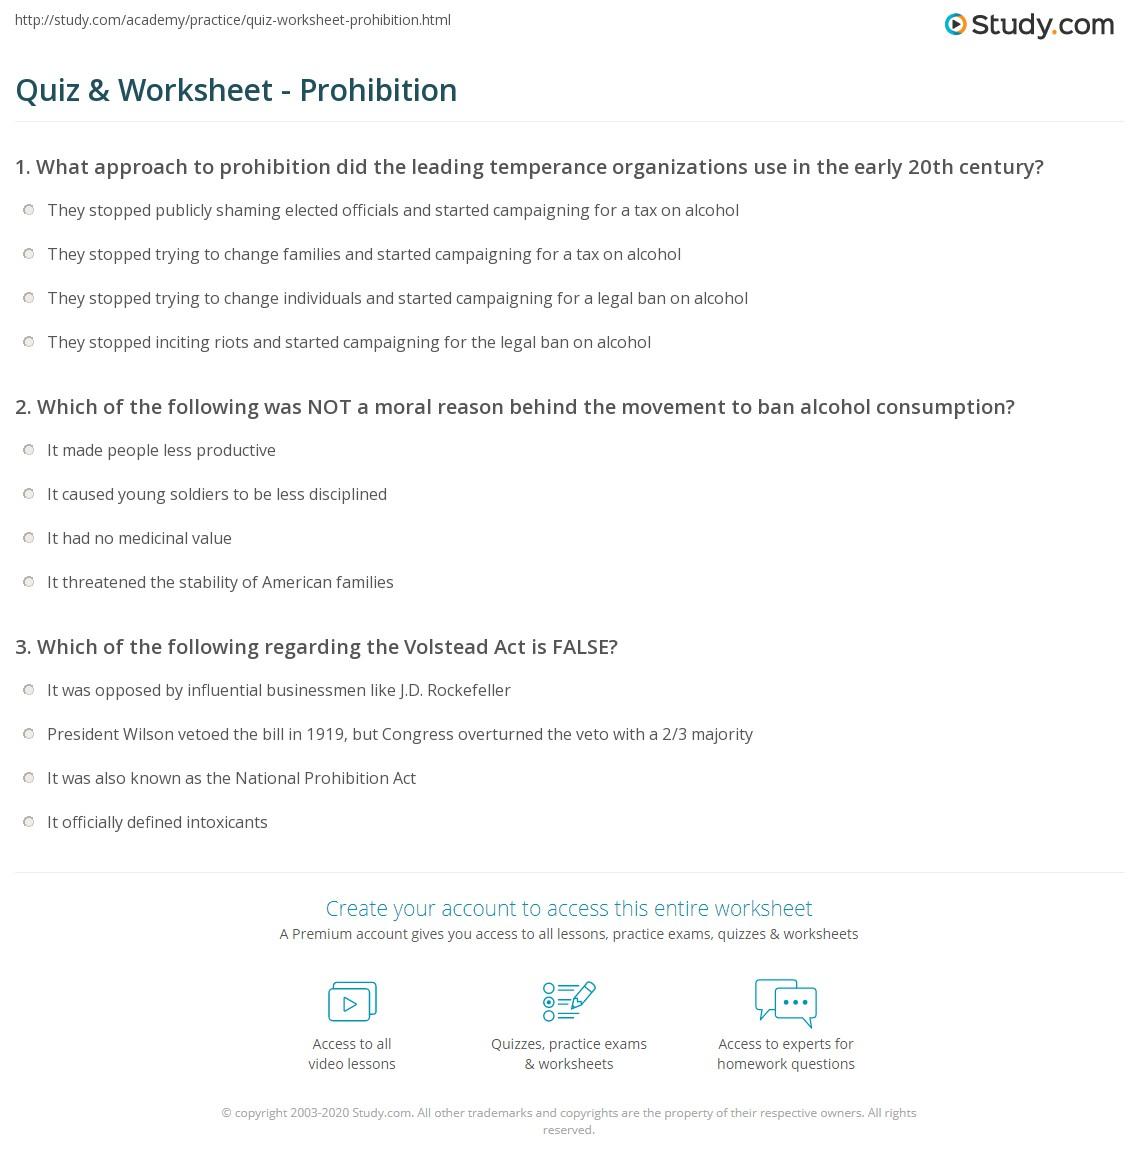 Quiz & Worksheet - Prohibition   Study.com